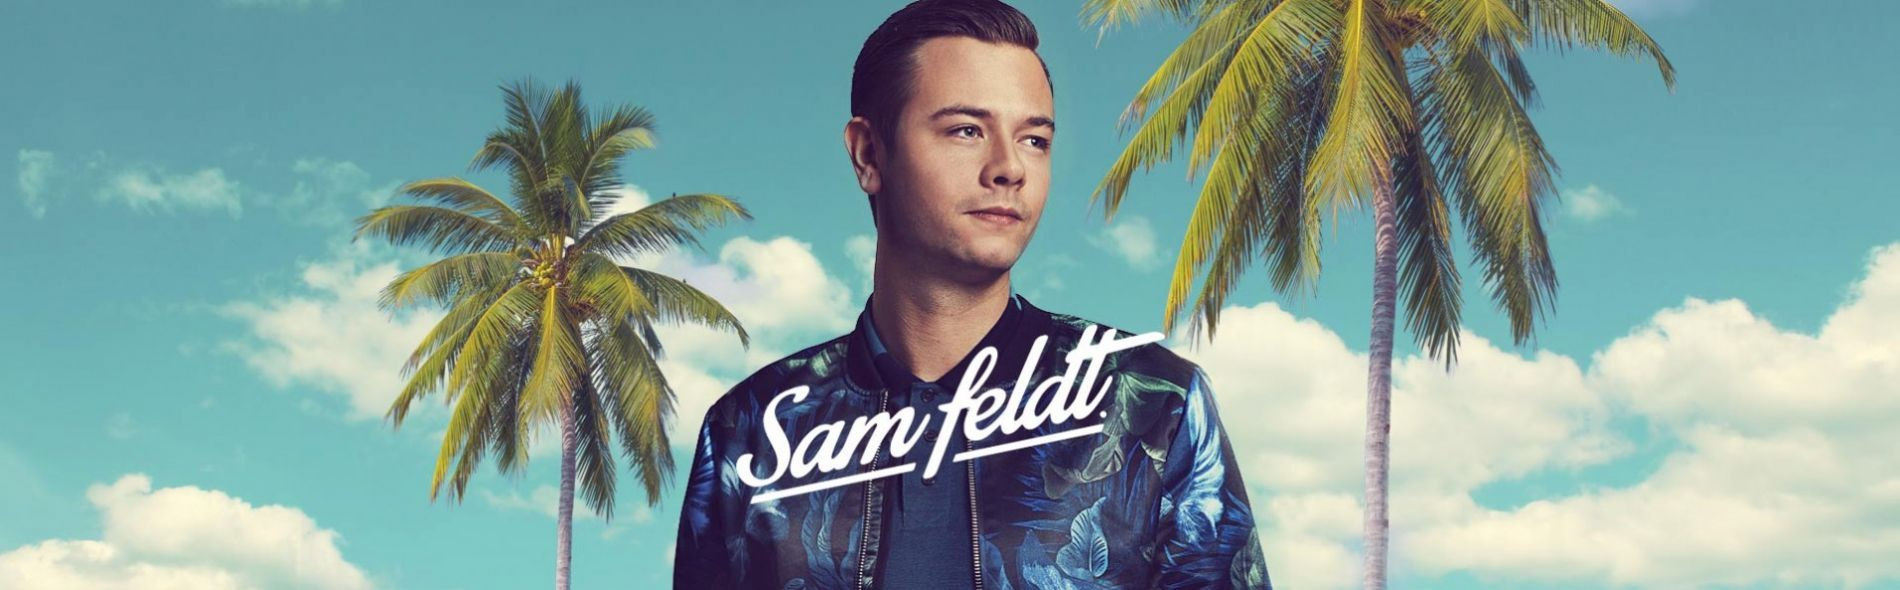 Sam Feldt Amsterdam Cruise Party